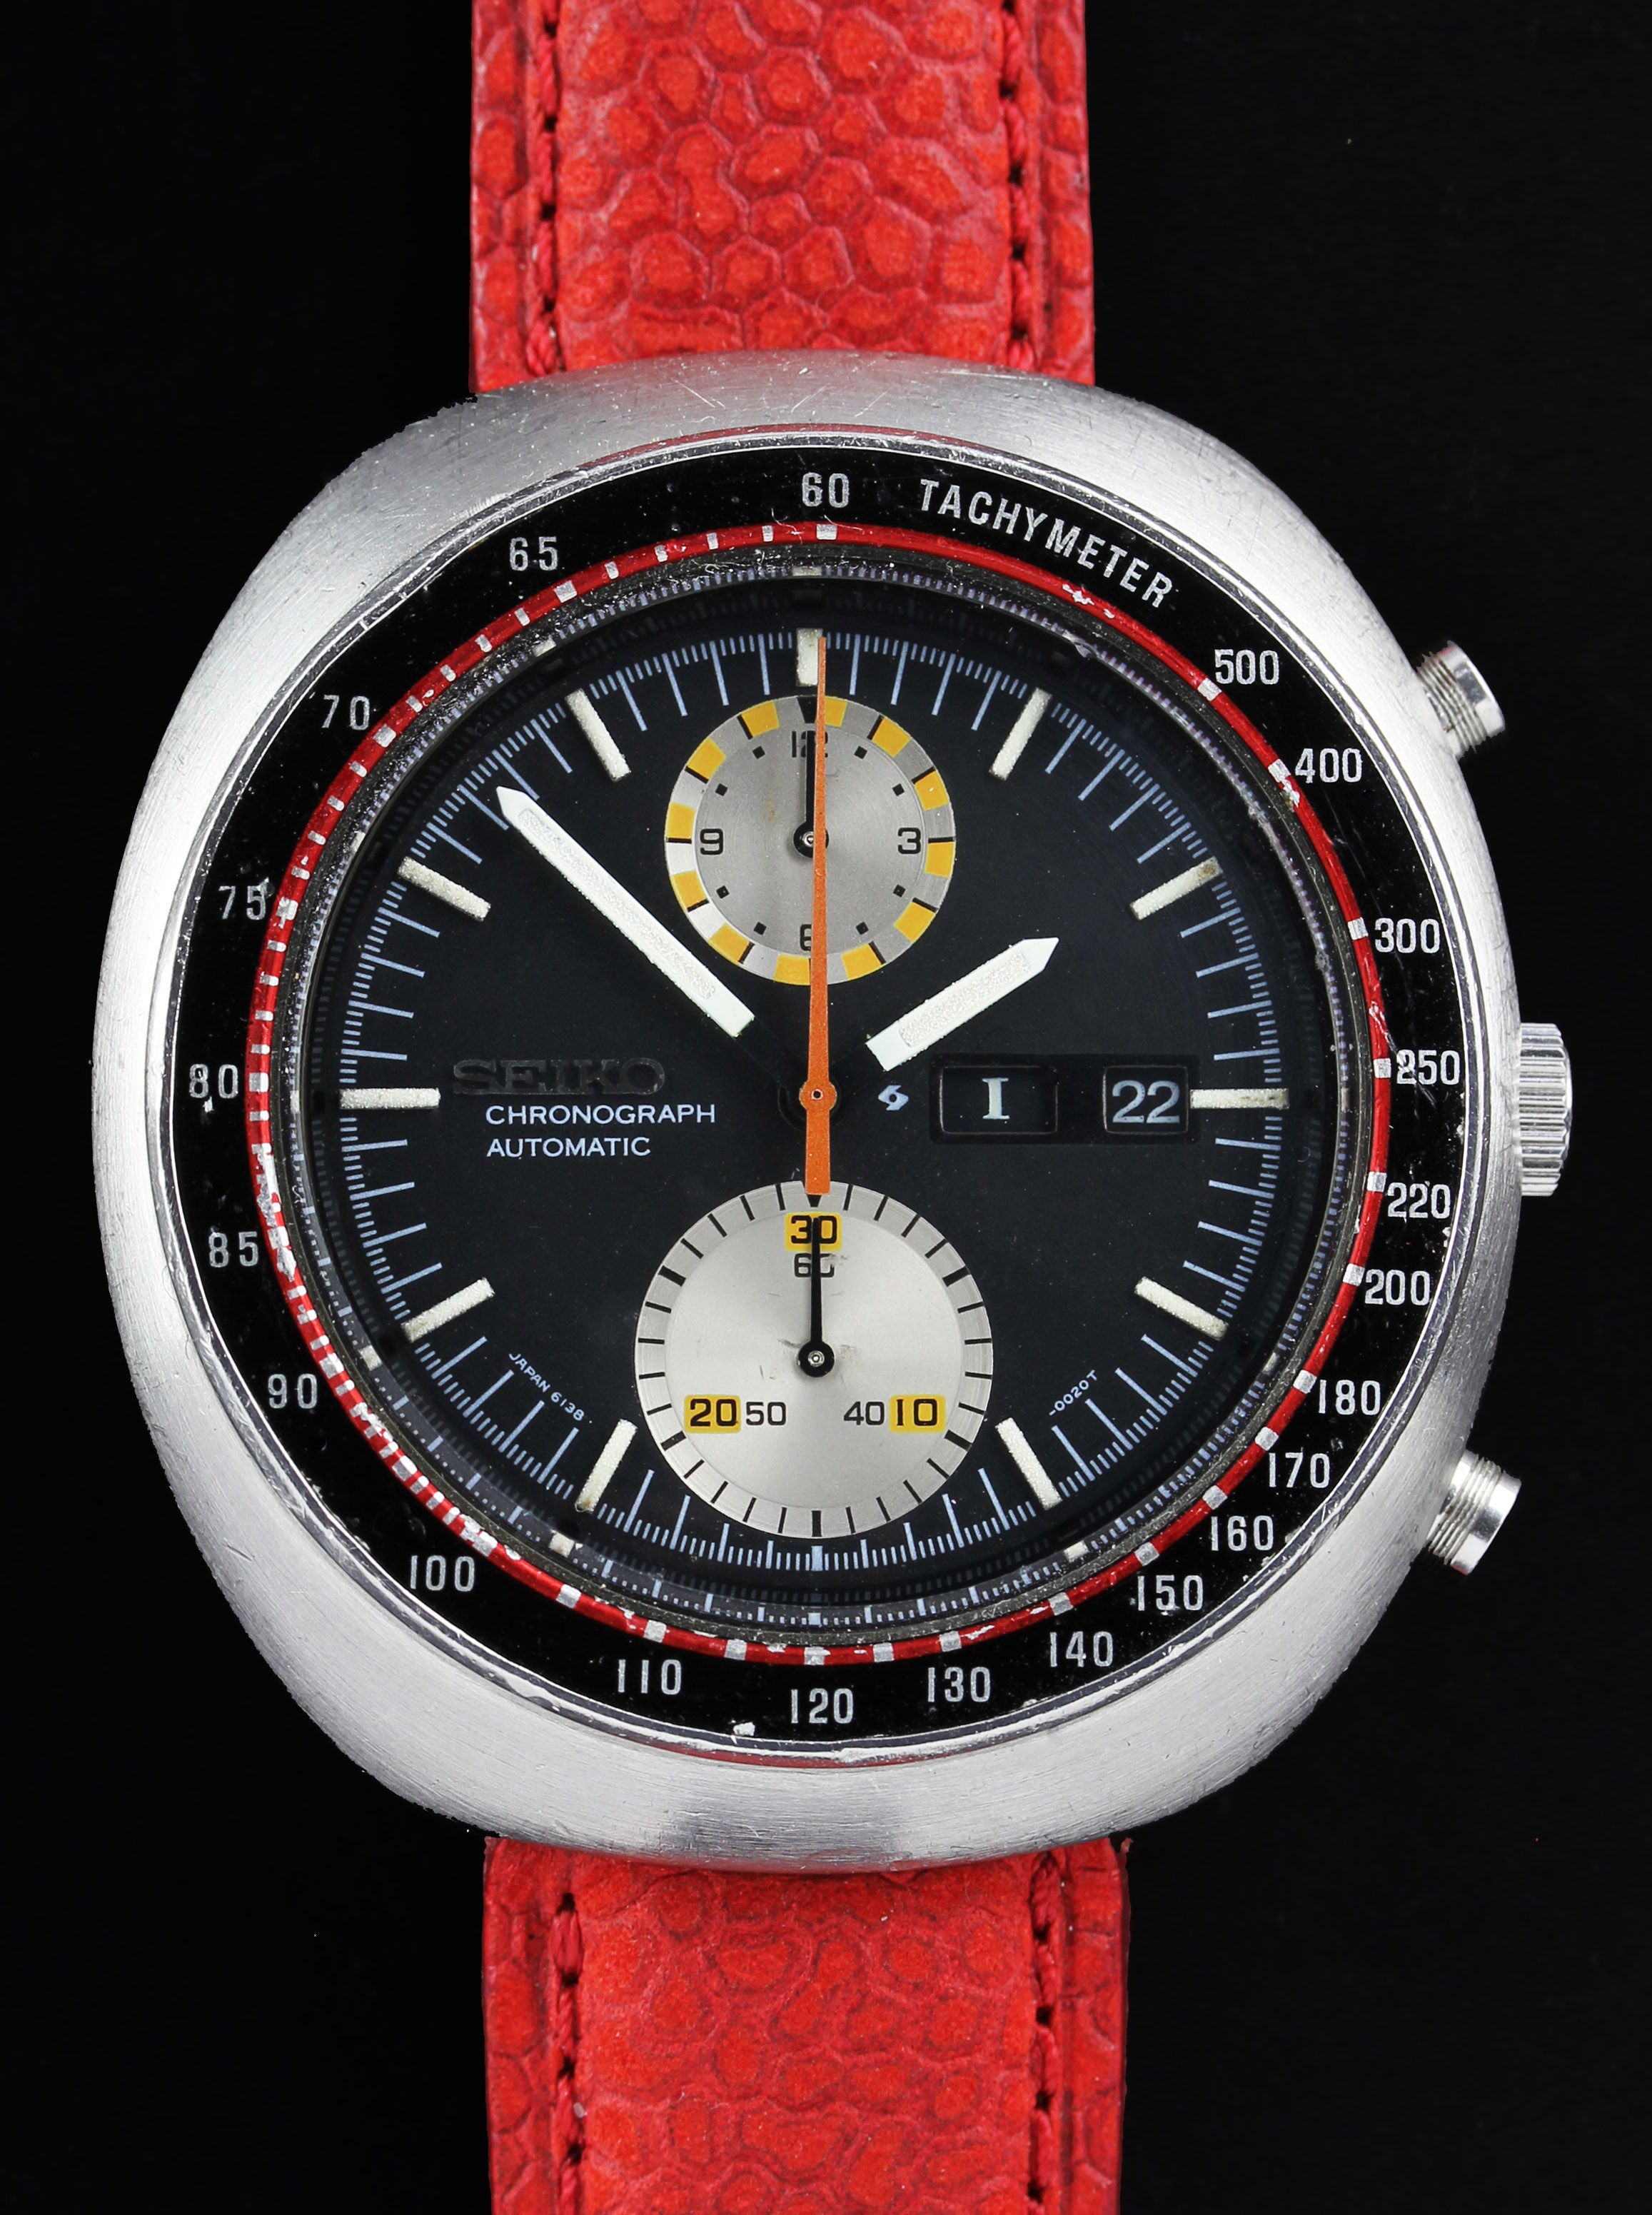 SEIKO automatic chronograph with calendar